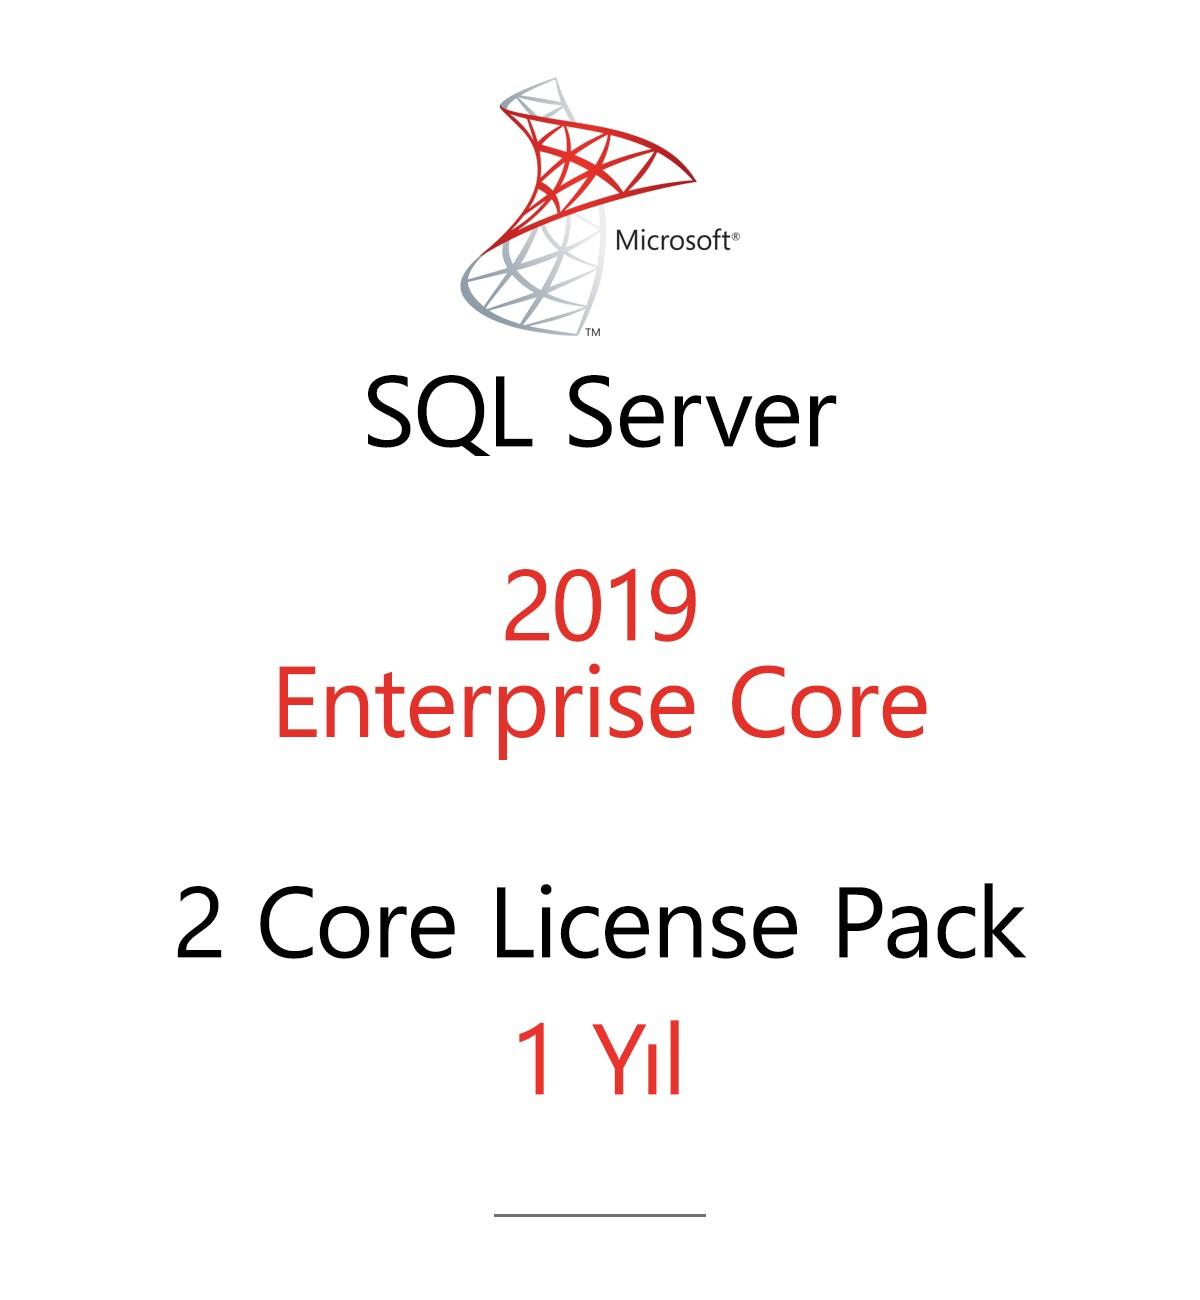 SQL Server Enterprise 2 Core License Pack 1 year